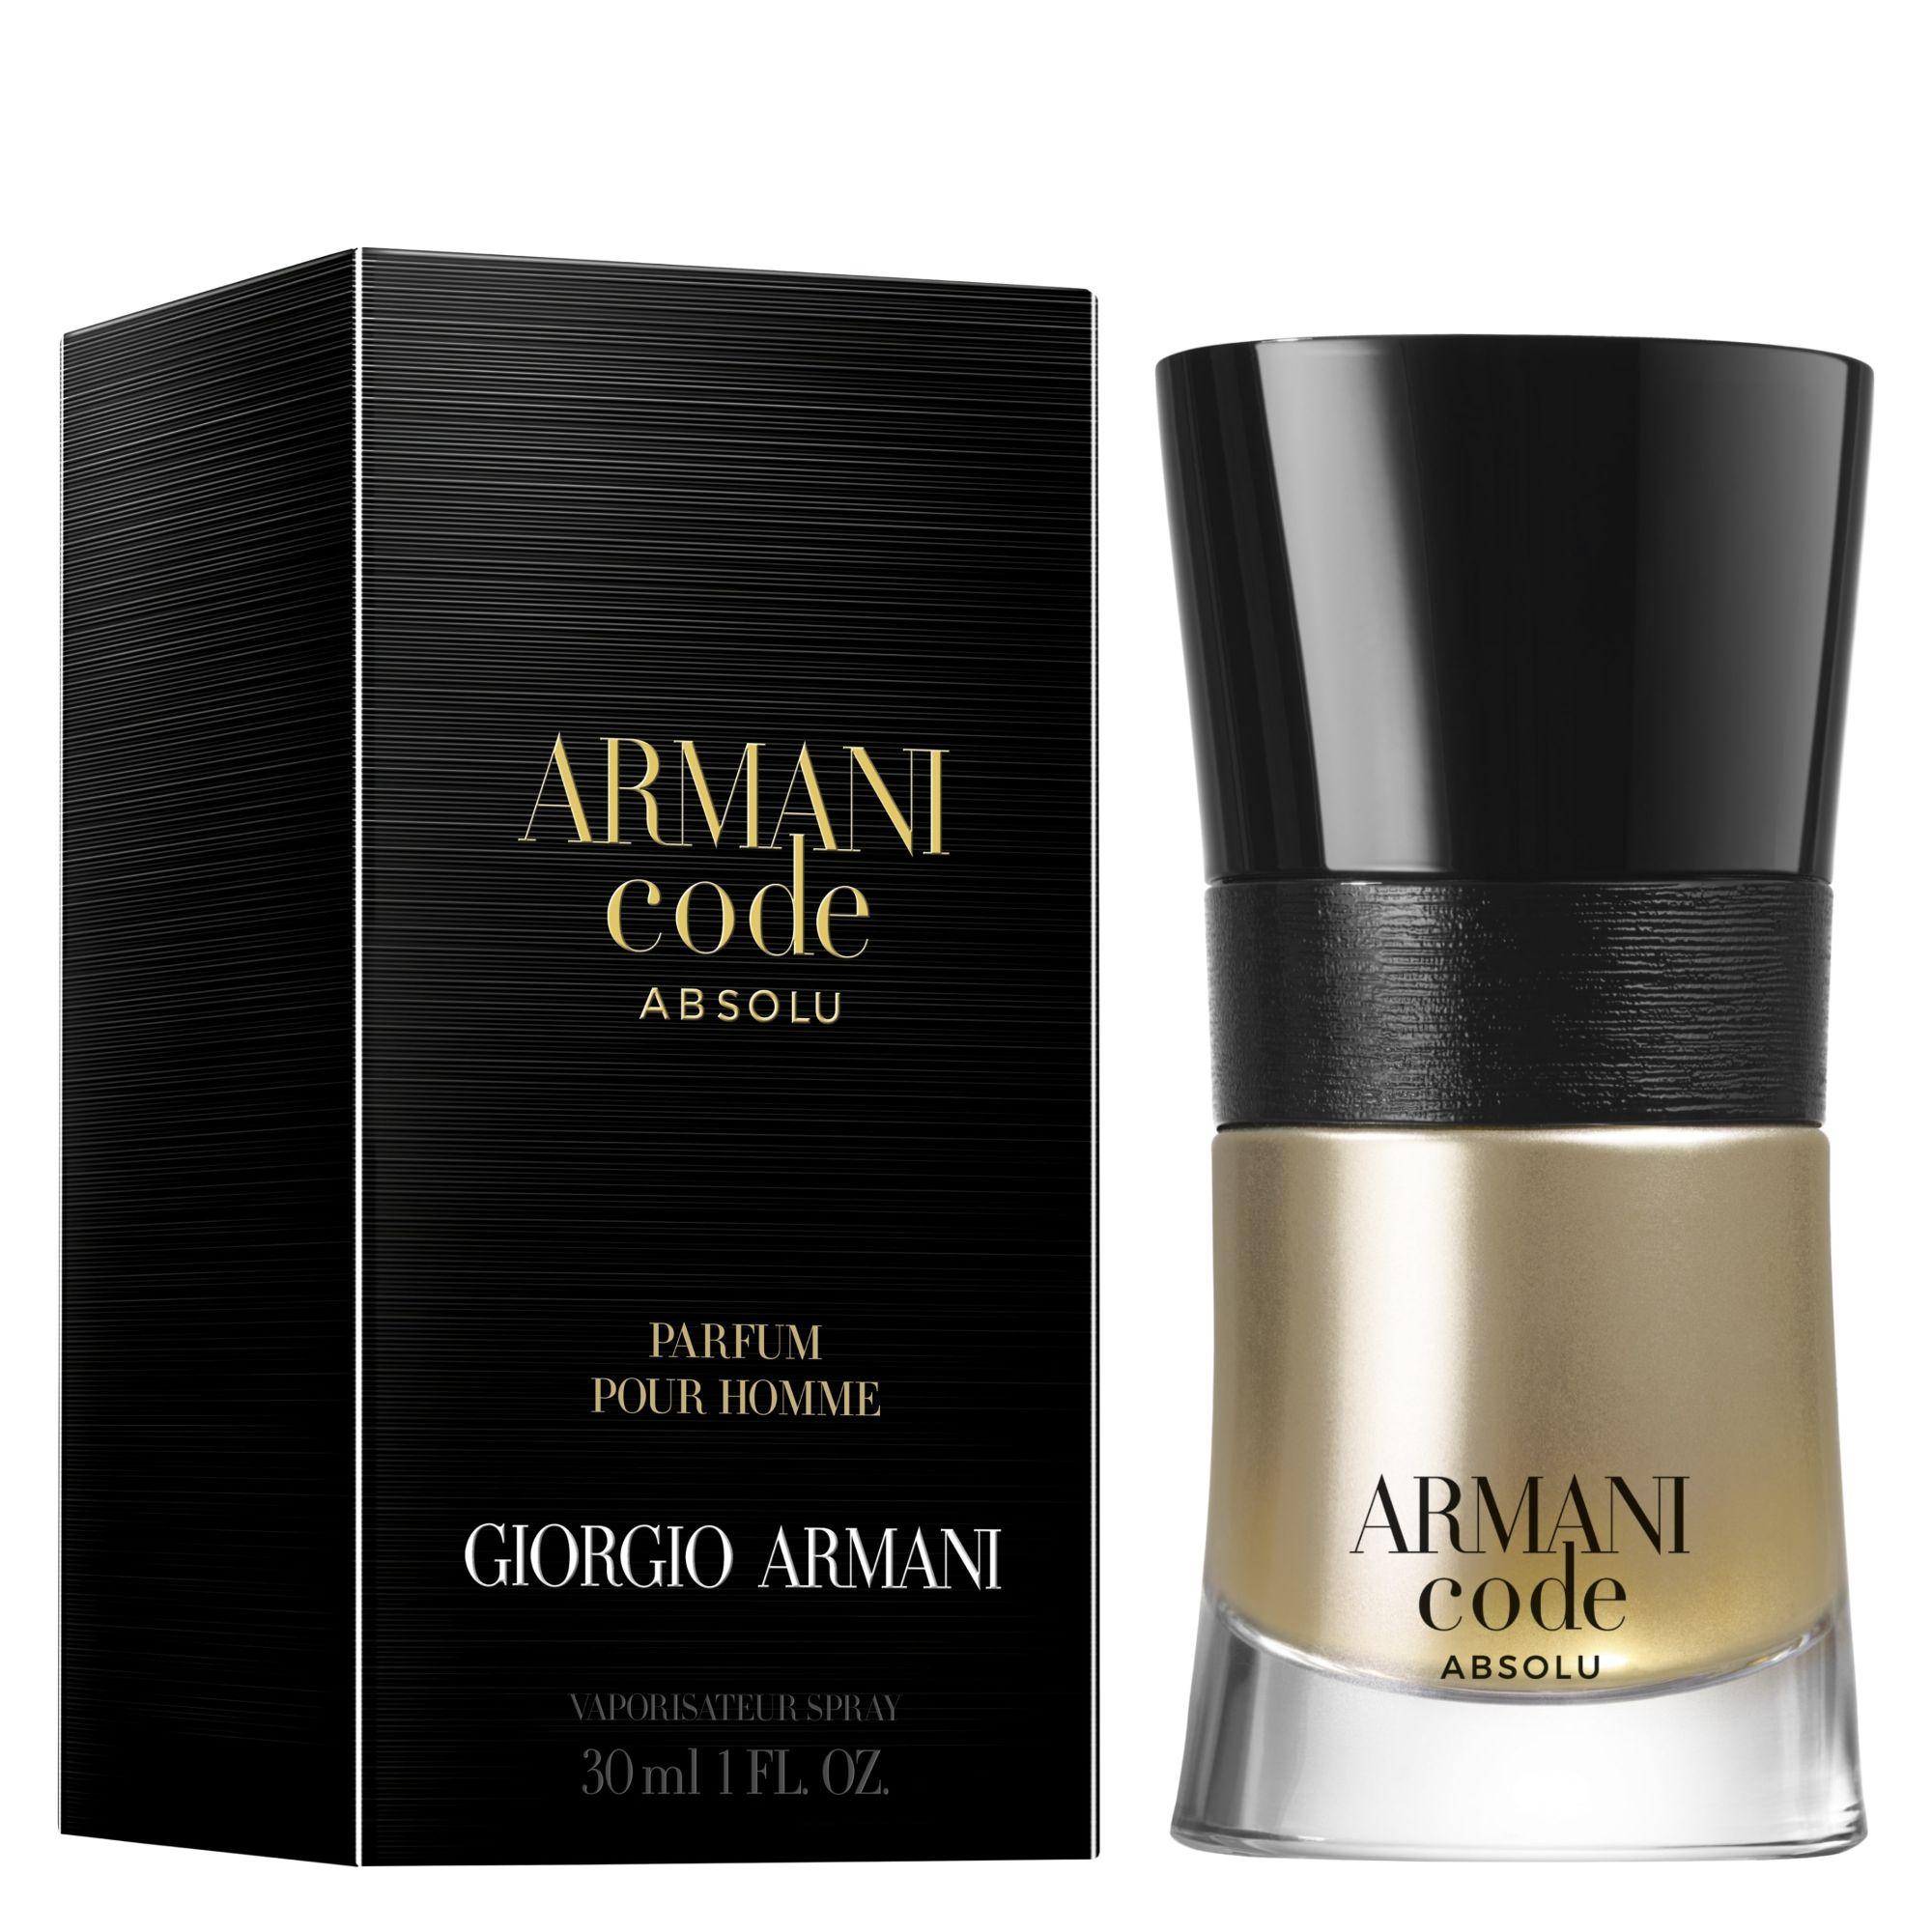 Giorgio Armani Armani Code Absolu EDP, 30 ml